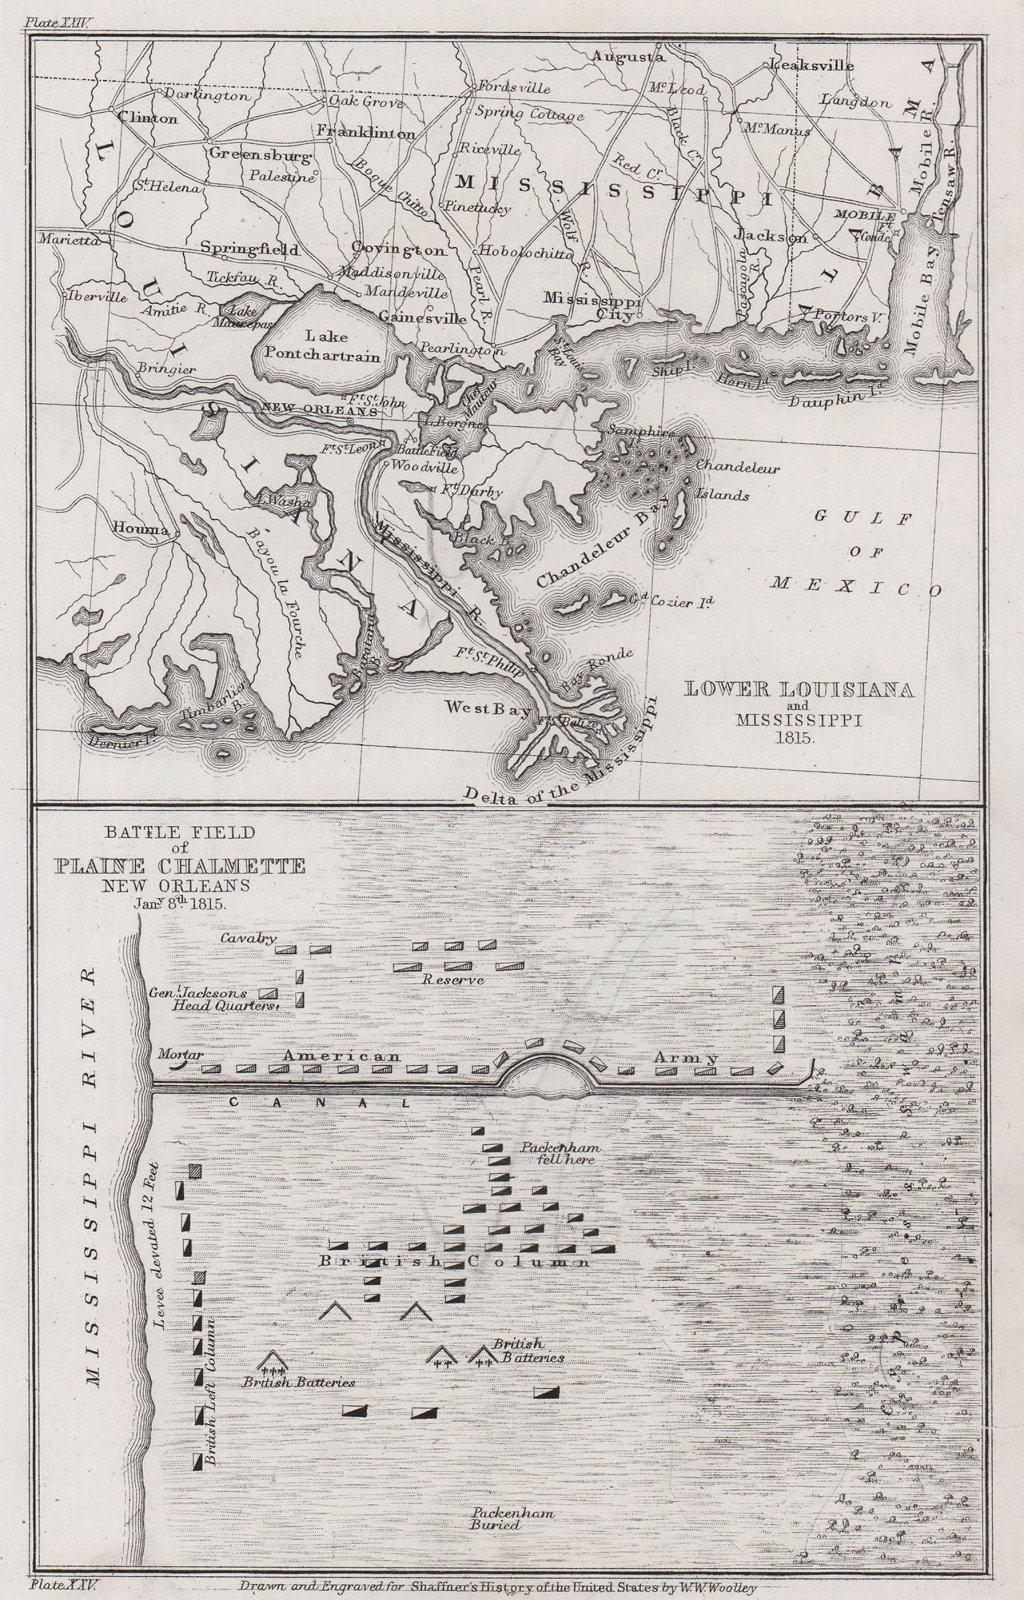 War of 1812. Battle of New Orleans 1815. Louisiana Chalmette 1863 old map